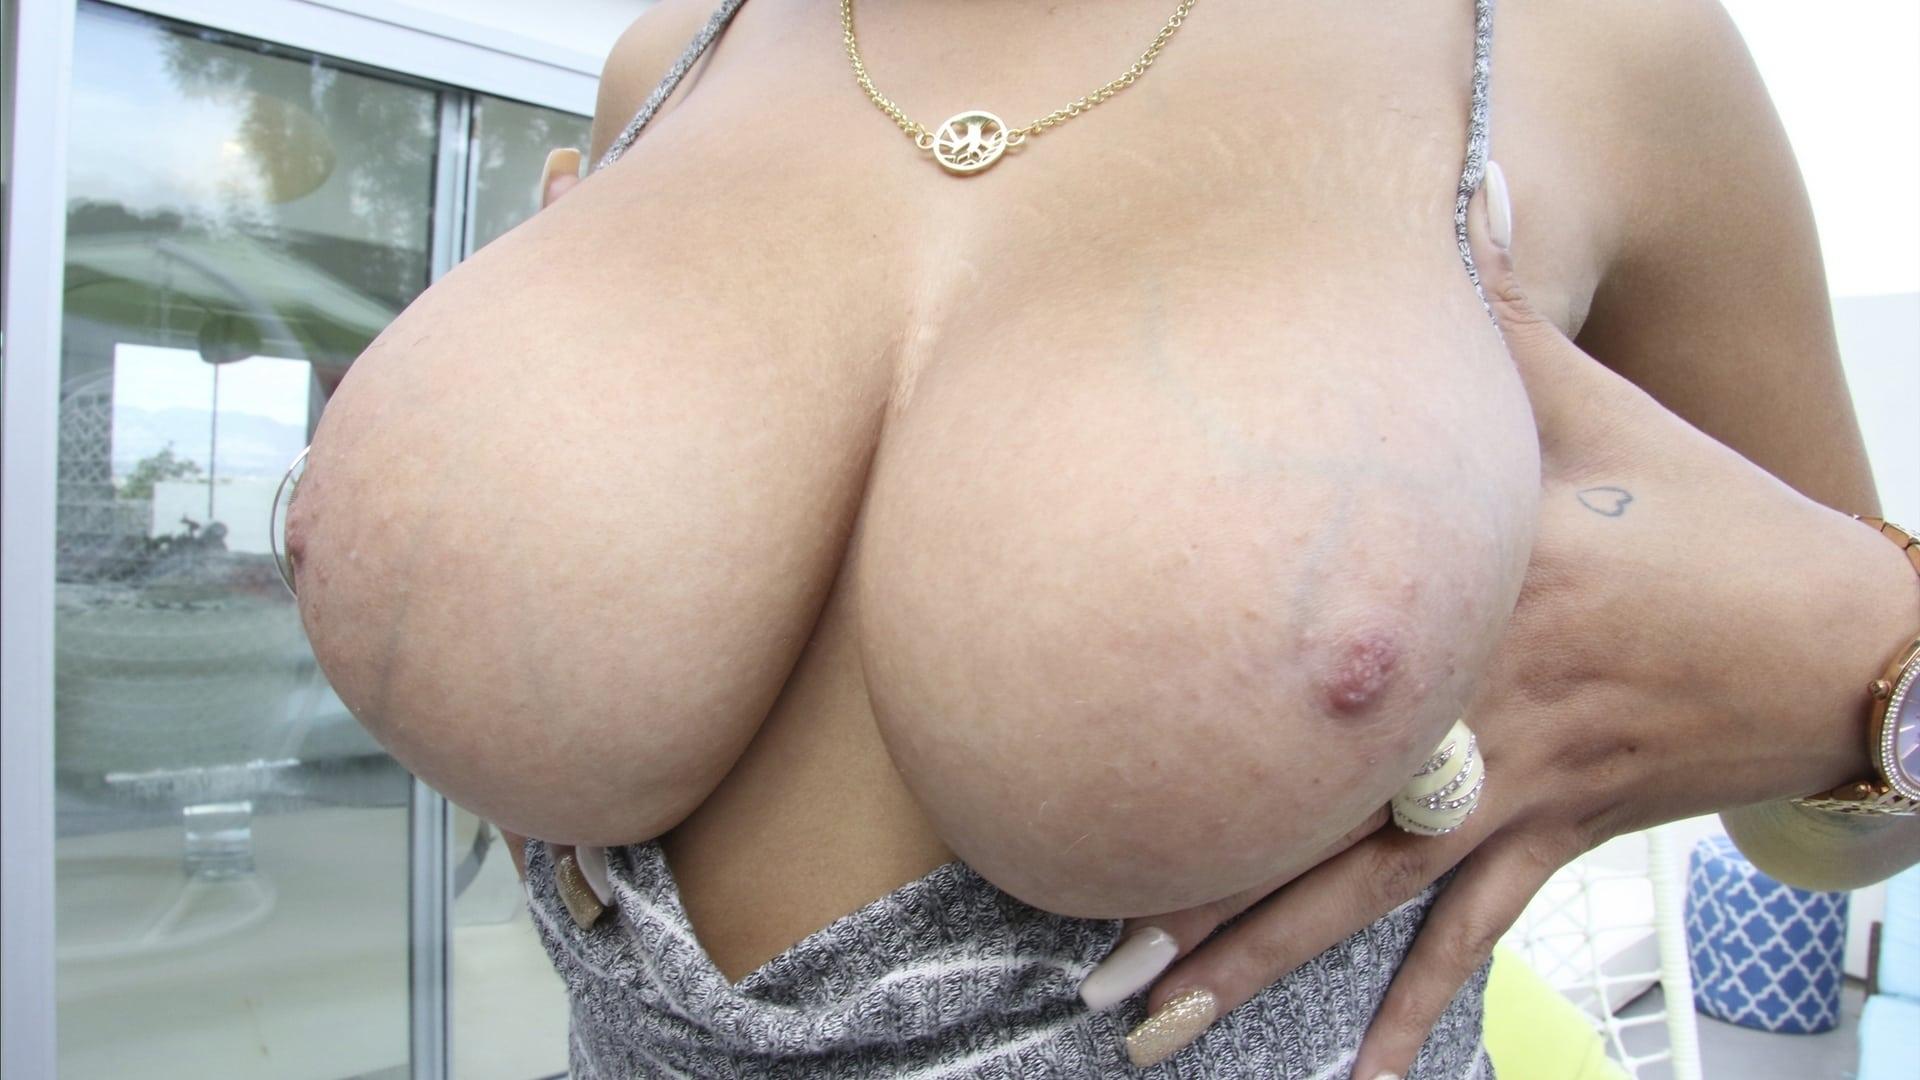 big-tits-rounds-asses